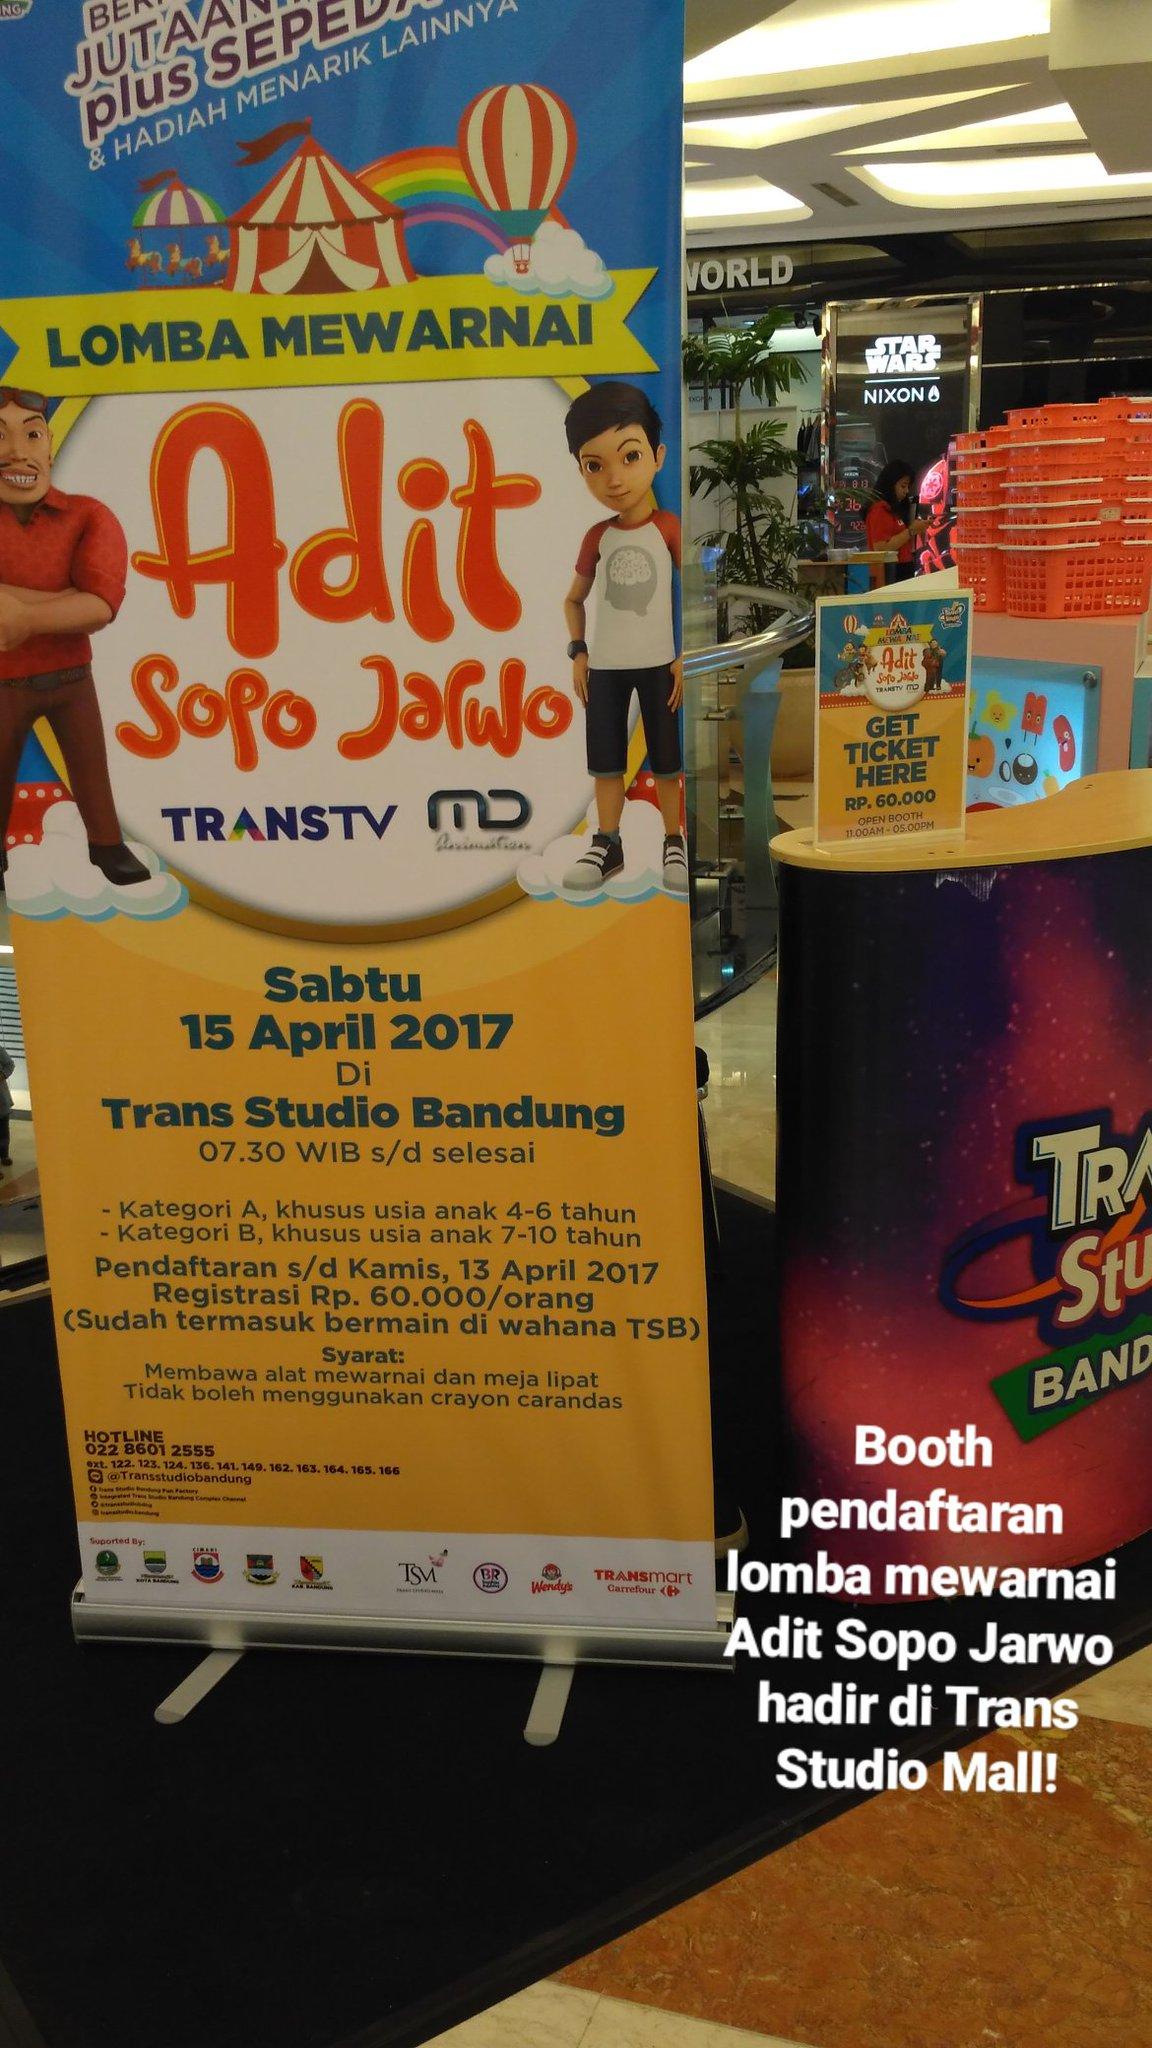 Trans Studio Bandung On Twitter Ayo Pendaftaran Lomba Mewarnai